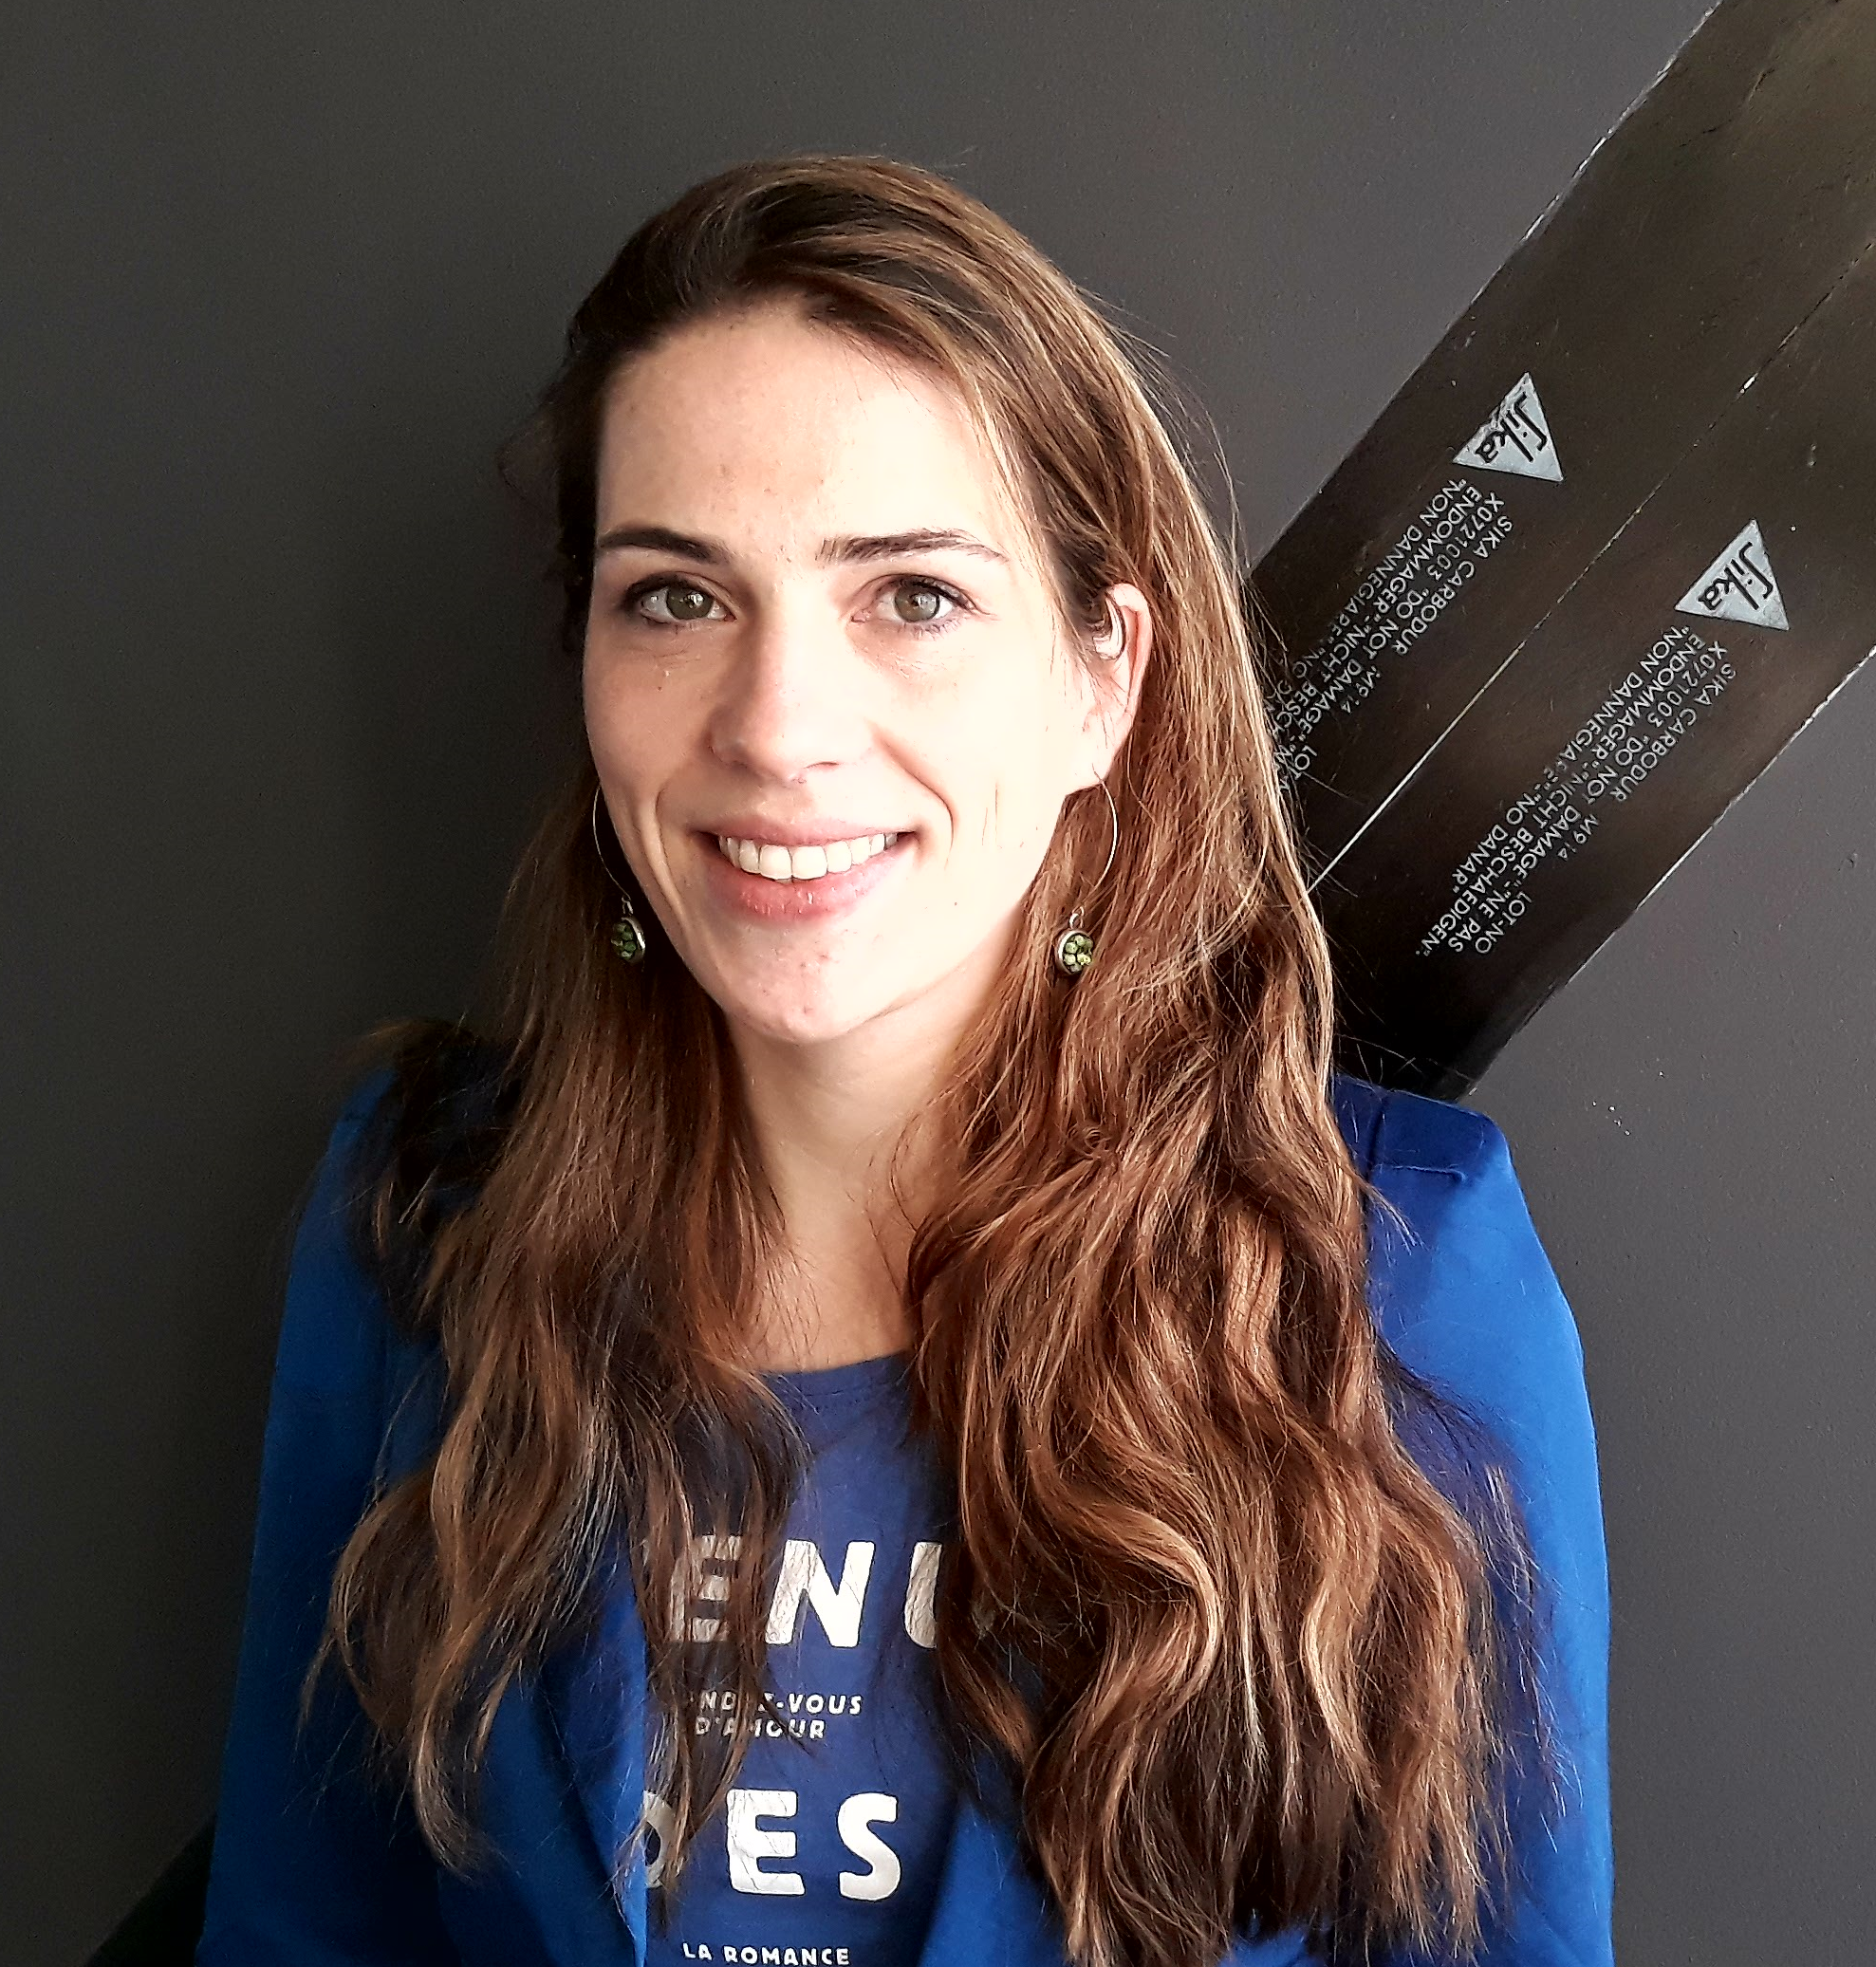 Rachelle van der Kemp